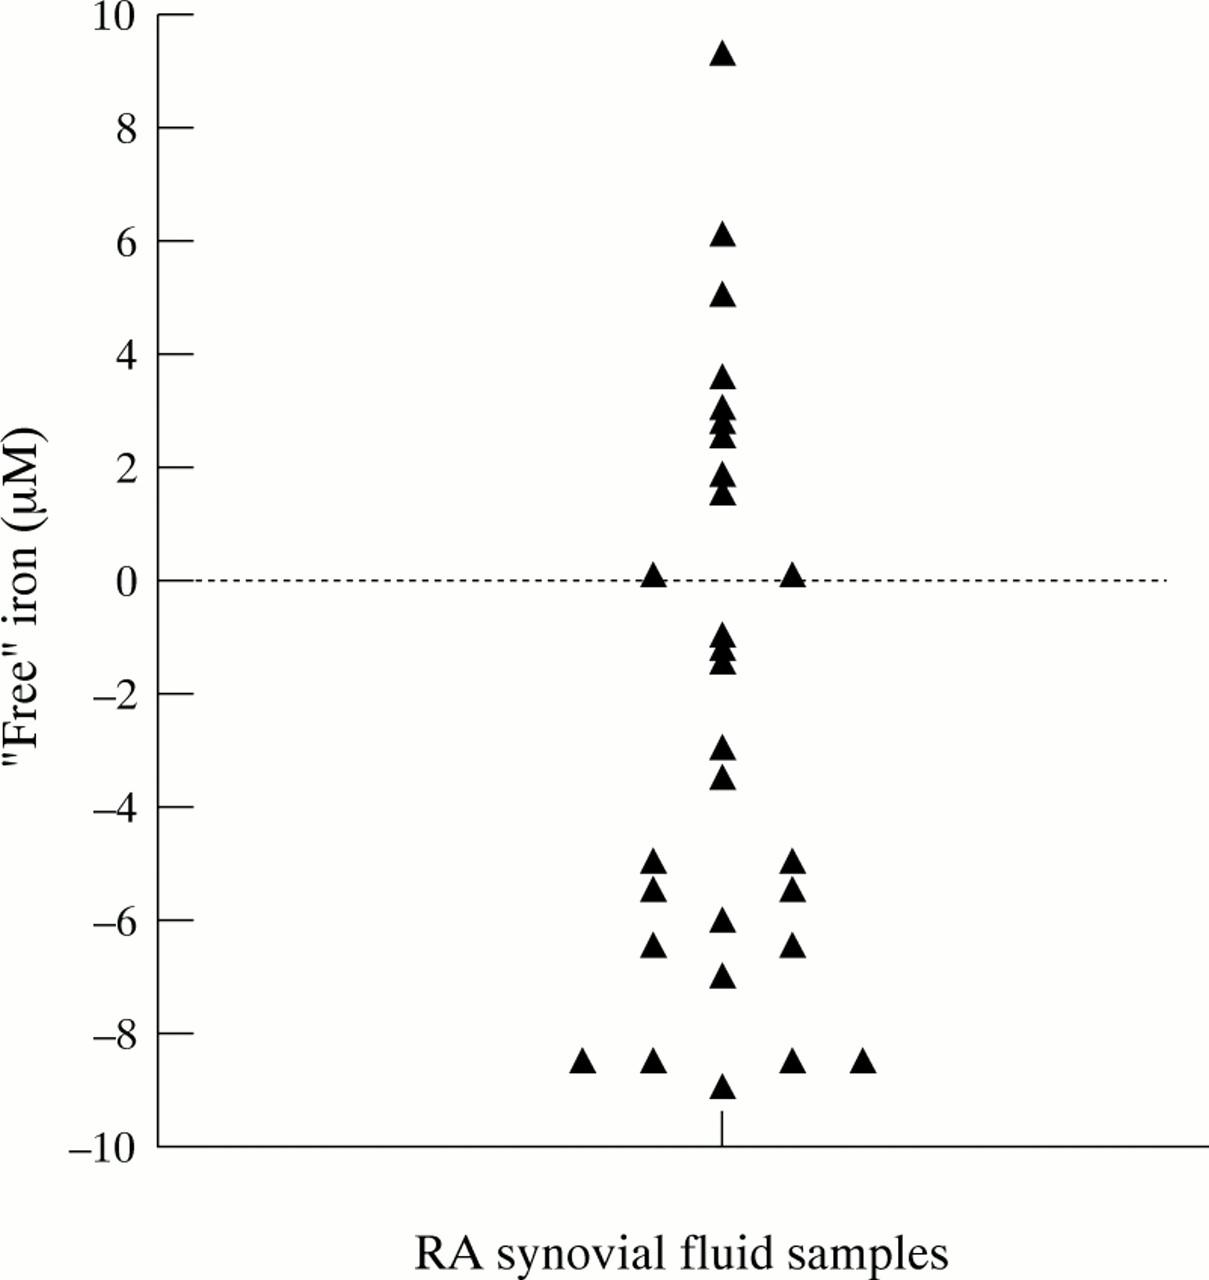 Iron, Lactoferrin And Iron Regulatory Protein Activity In